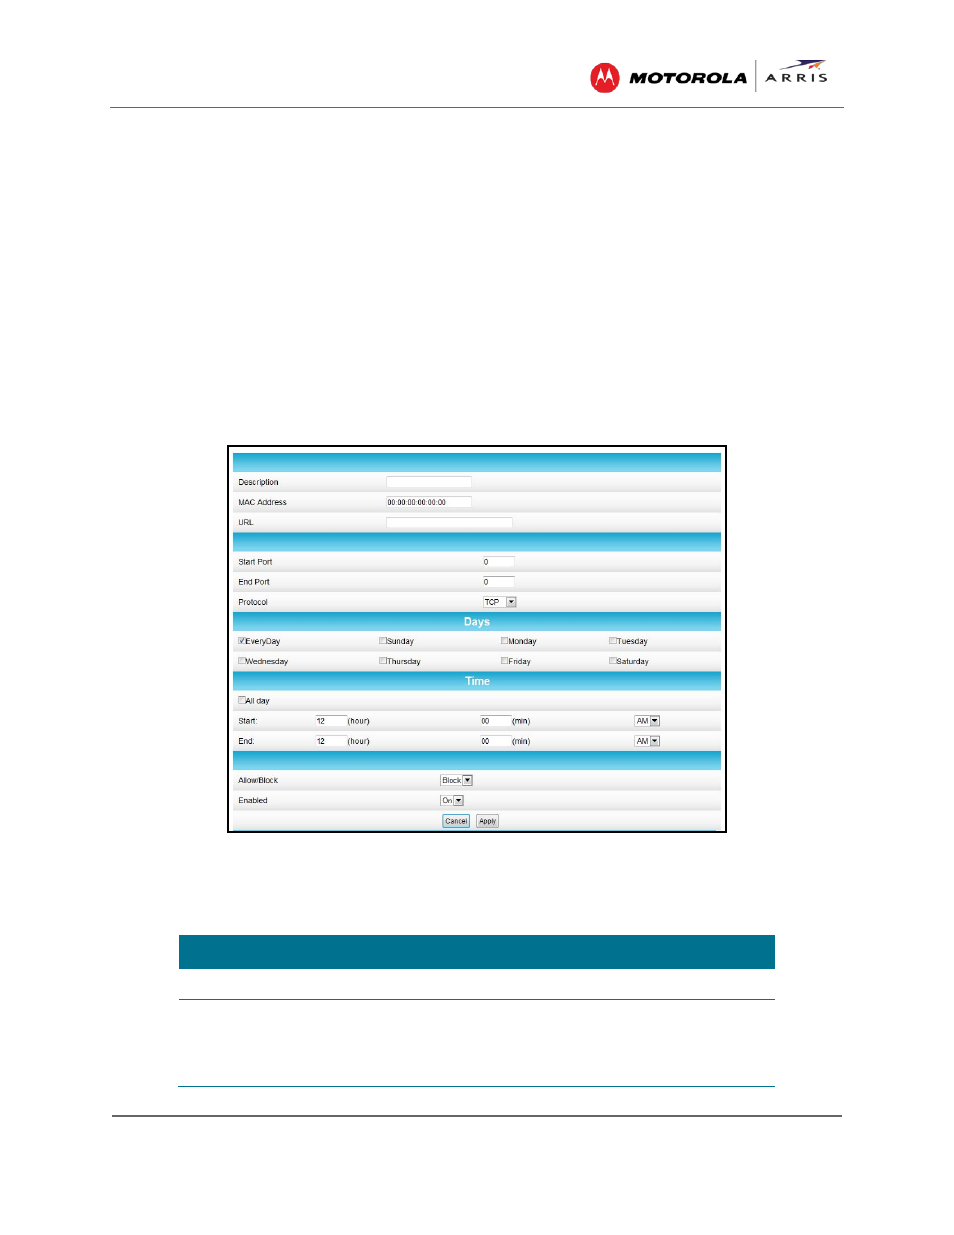 15 Firewall U2013 Using Parental Controls Manual Guide